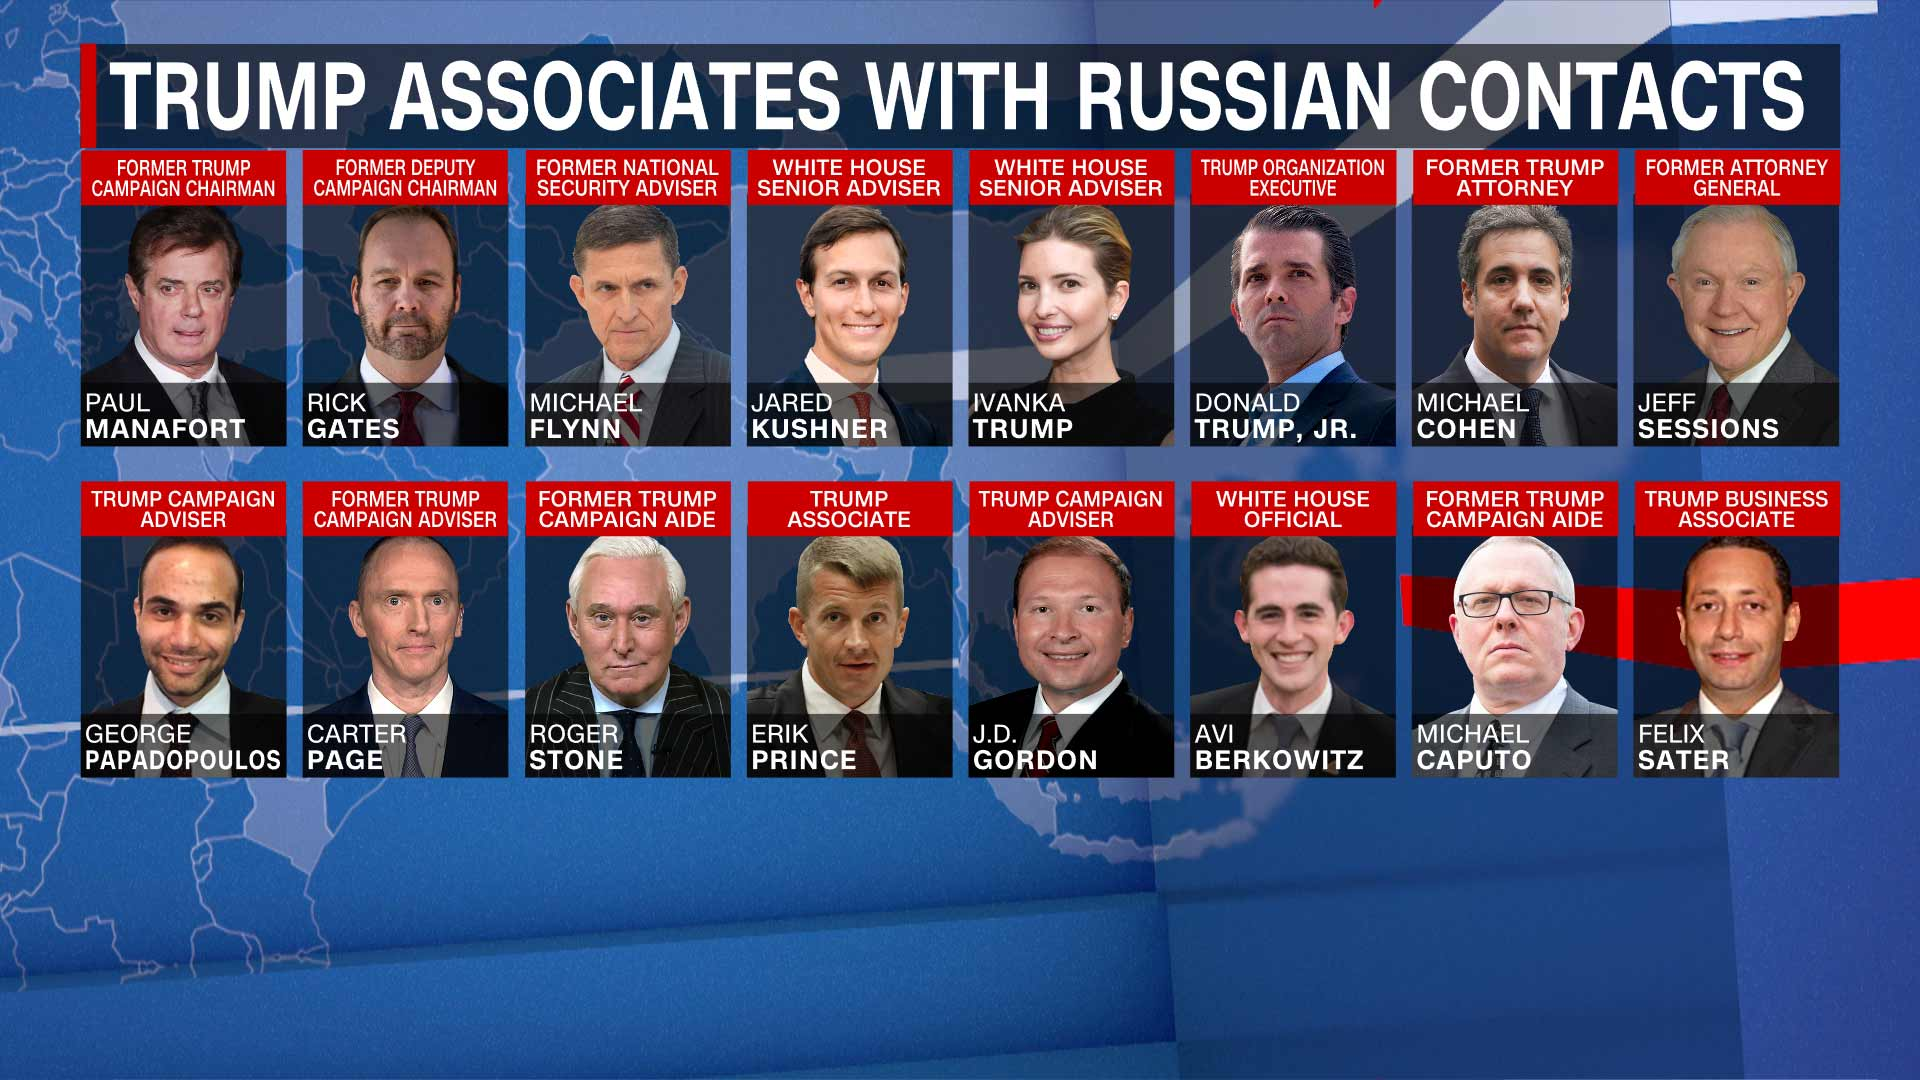 Links between Trump associates and Russian officials